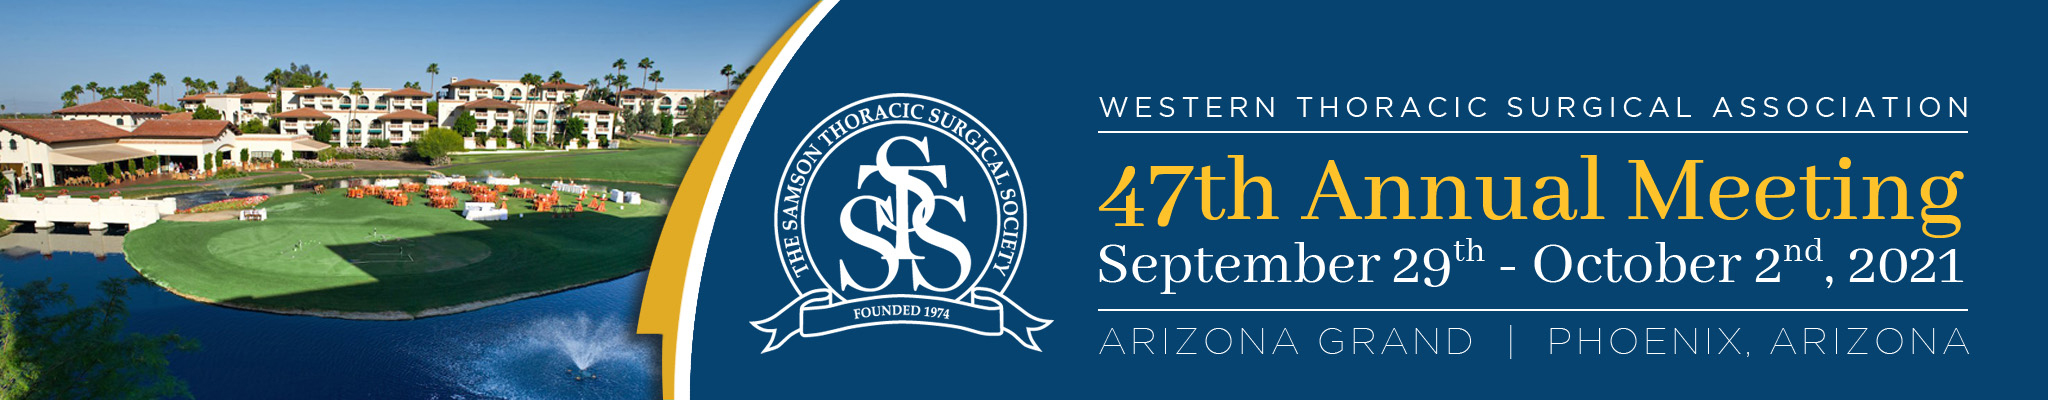 47th Annual Meeting